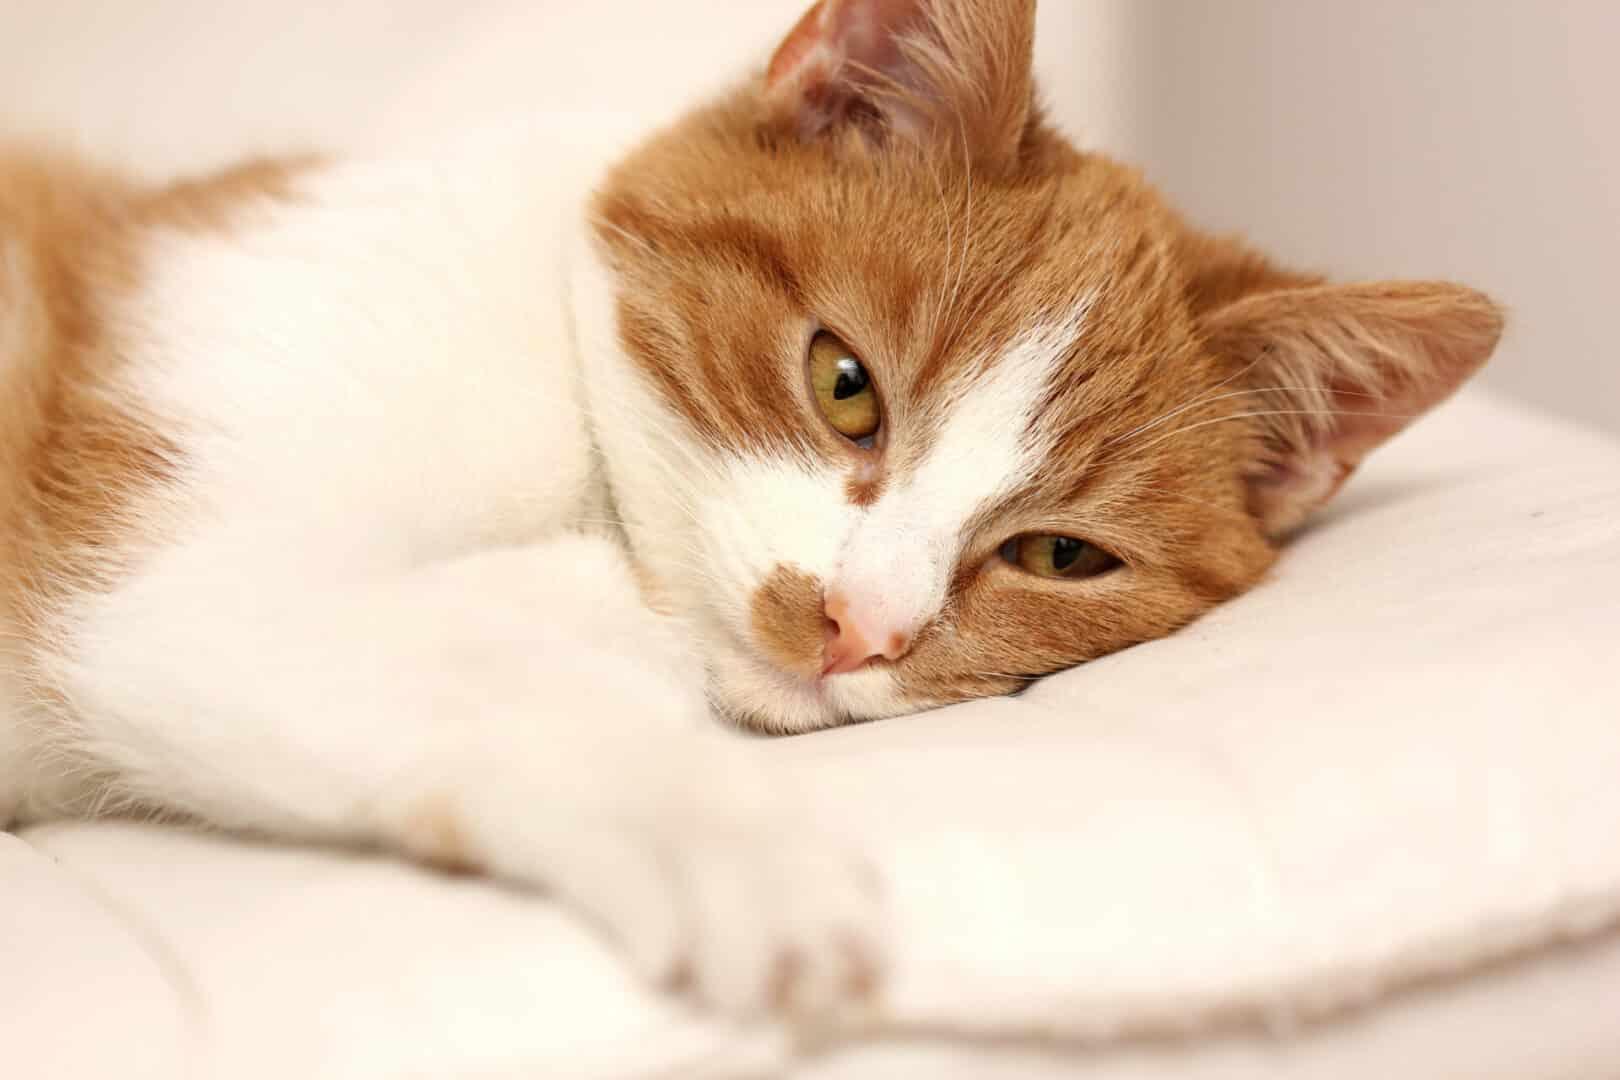 Chronic Obstructive Pulmonary Disease in cats